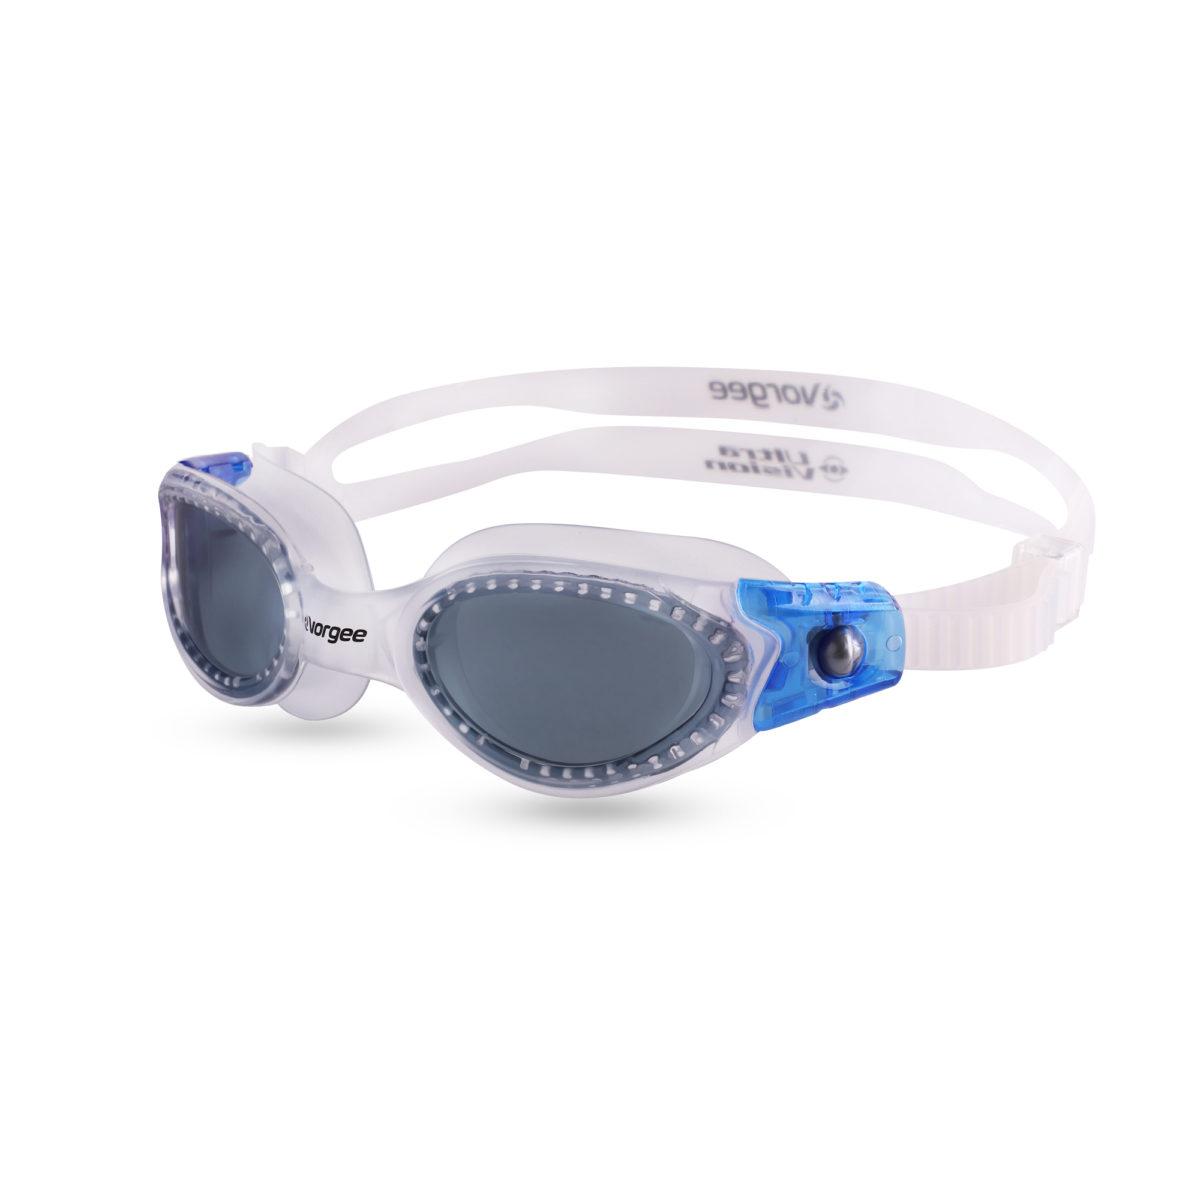 Vortech Narrow Fit Tinted - translucent & blue